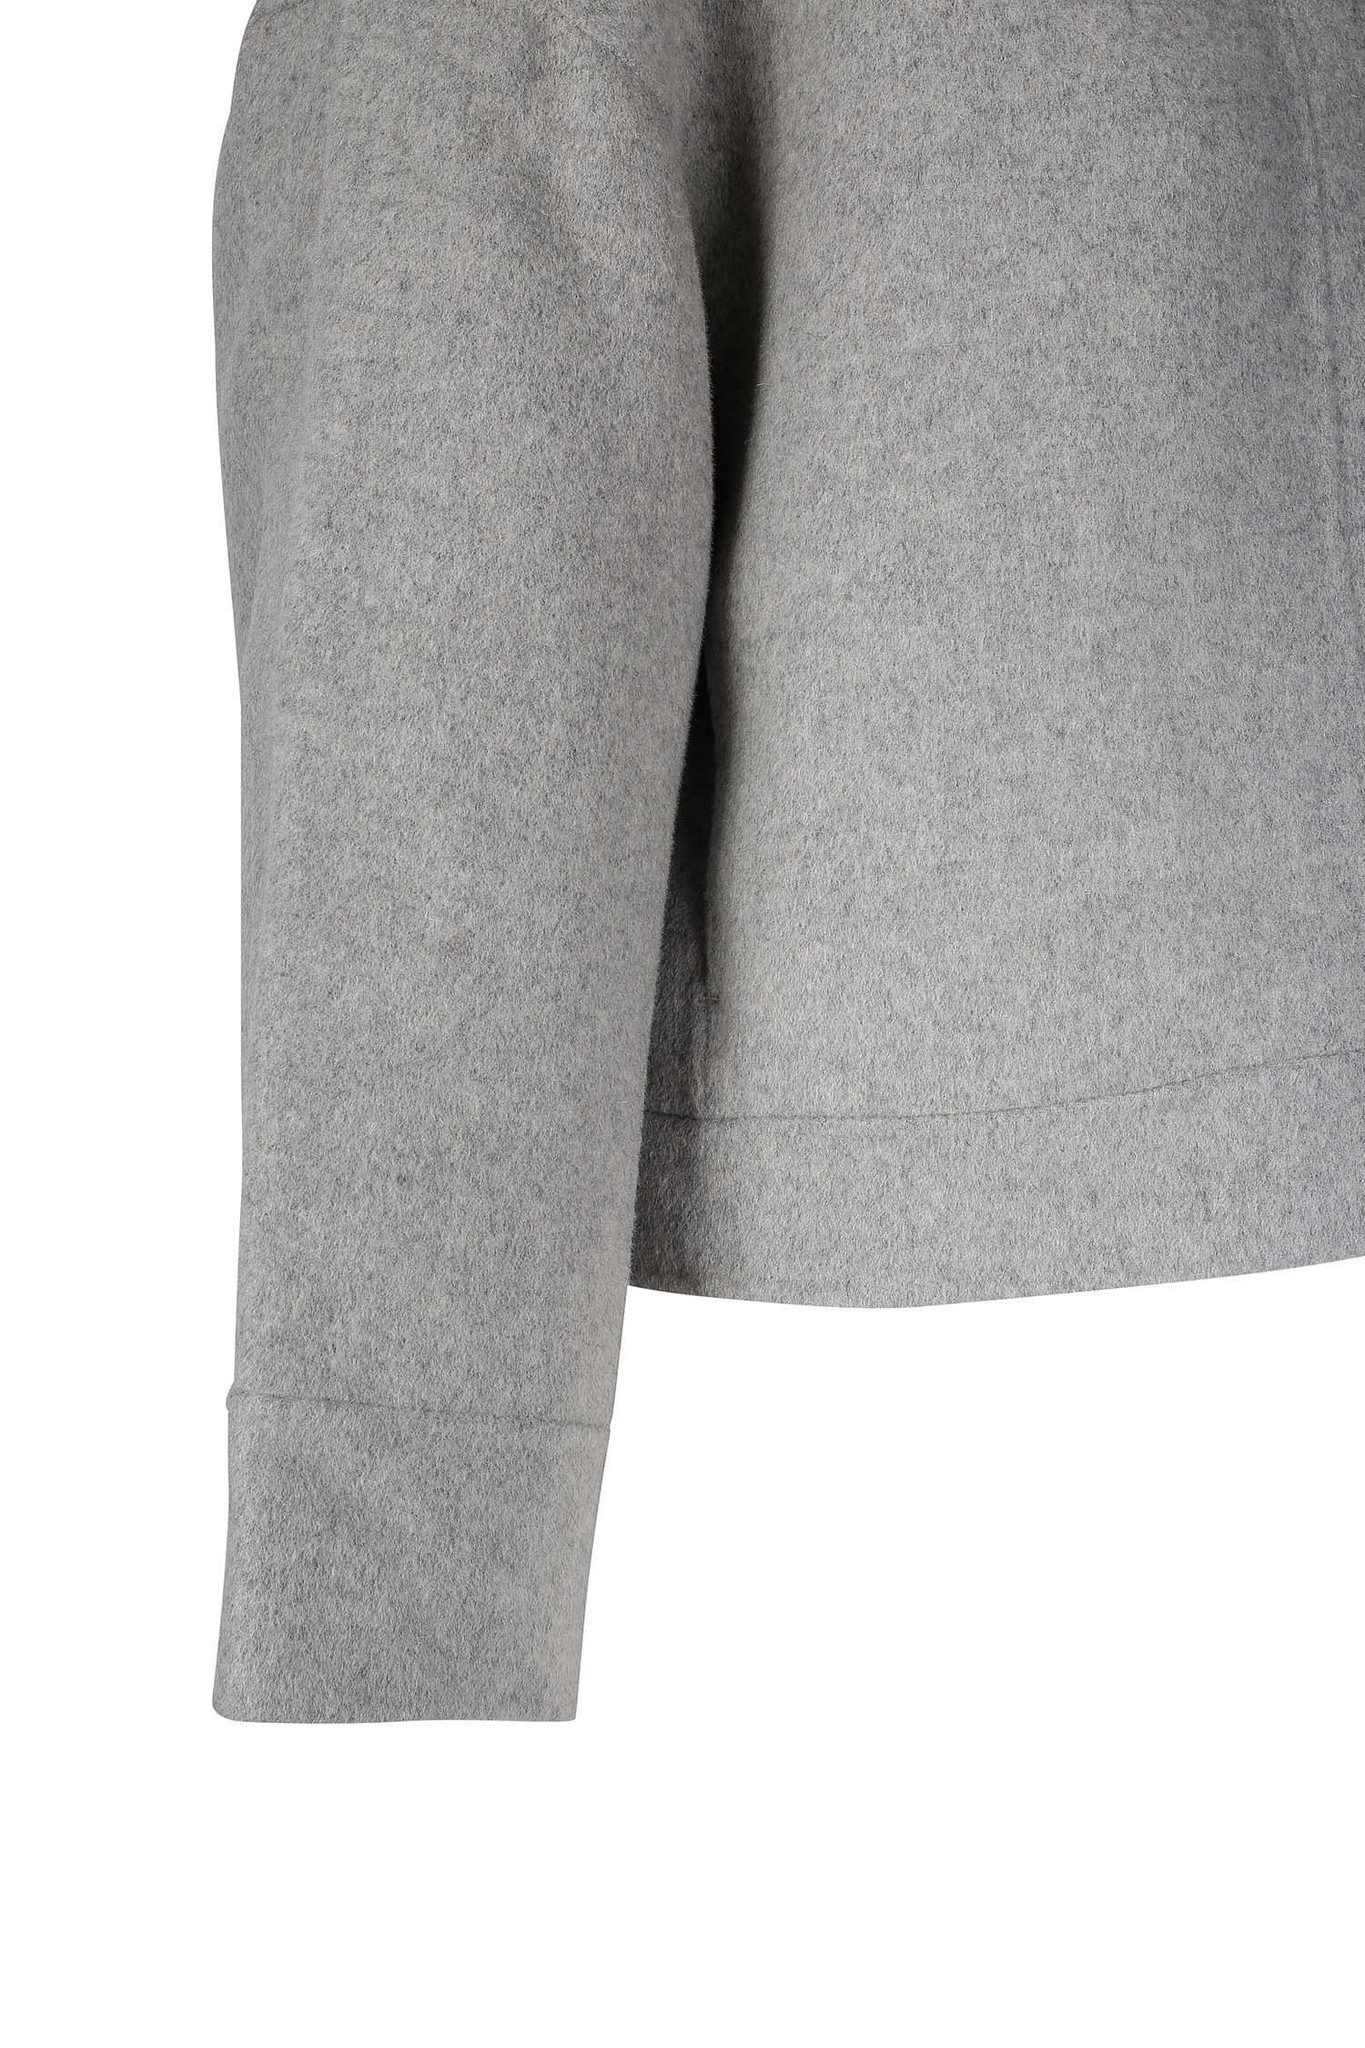 Andy Wool Jacket - Light Grey XS-4